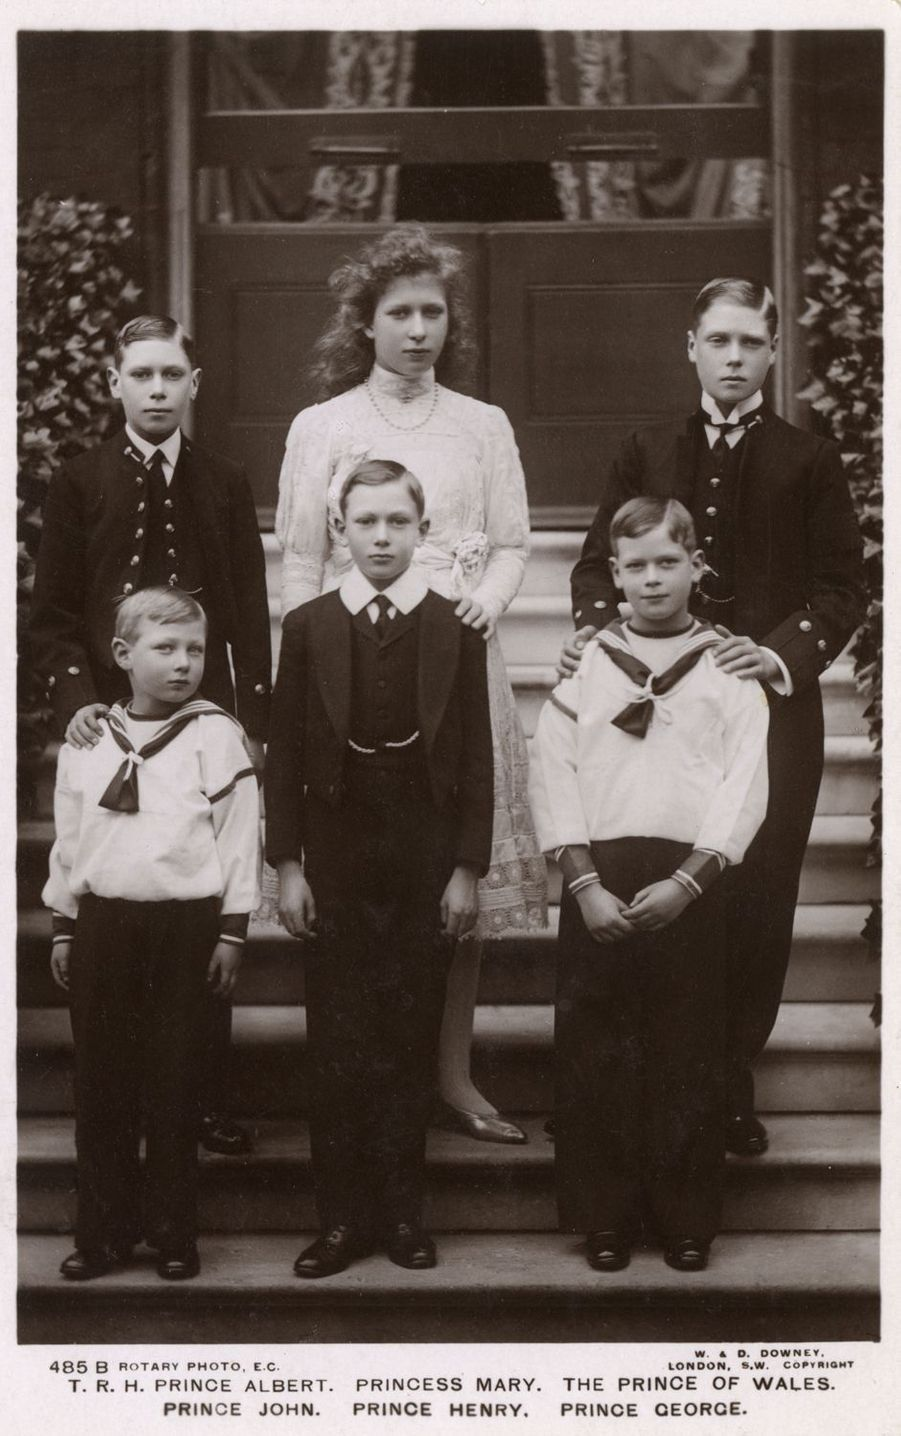 Le prince John avec ses frères et sa soeur, en 1912